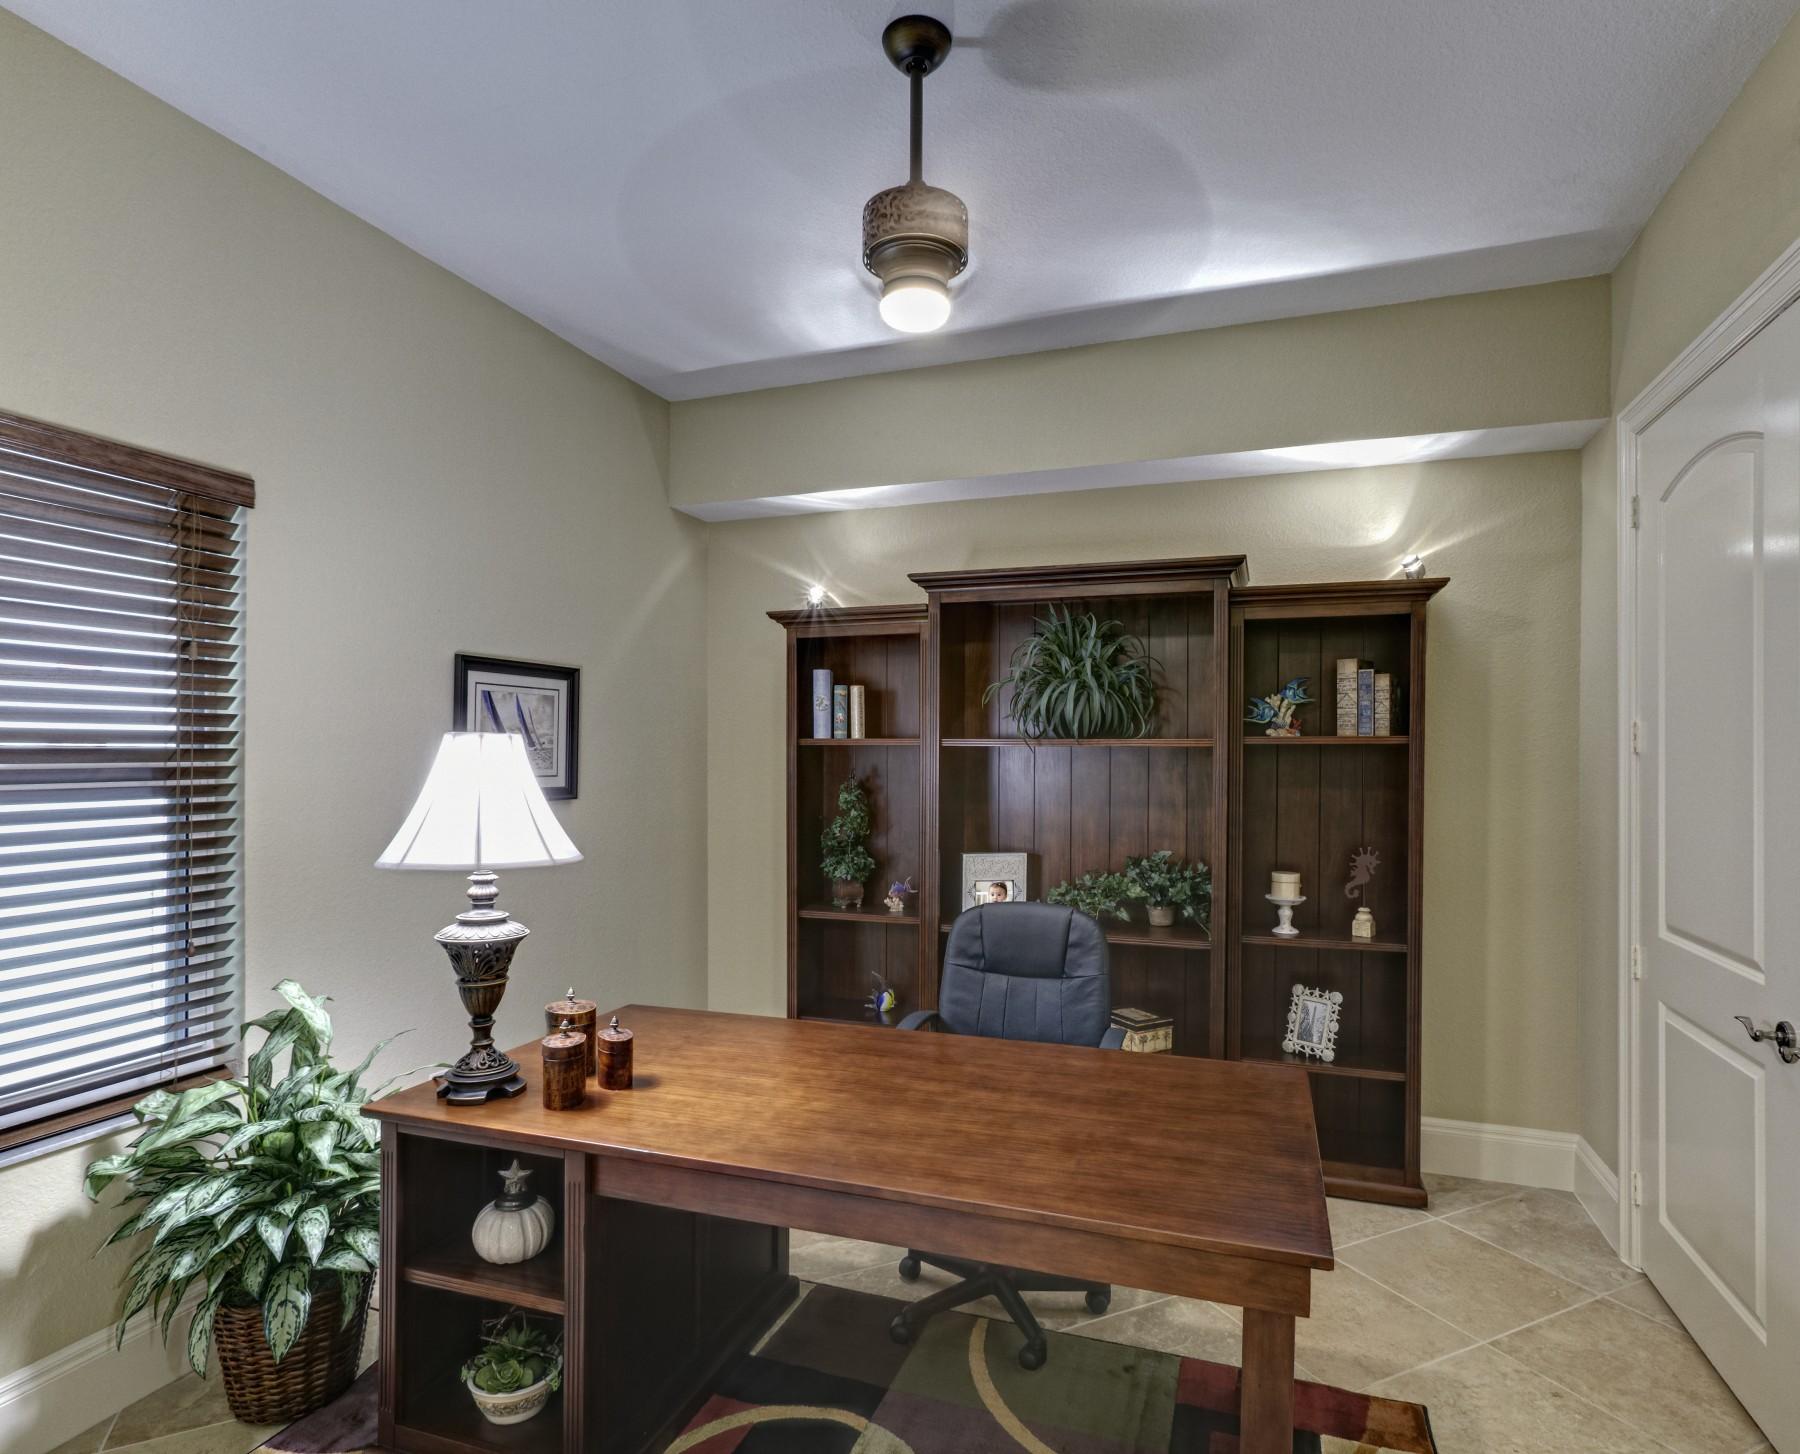 home office lighting - Tim Kyle